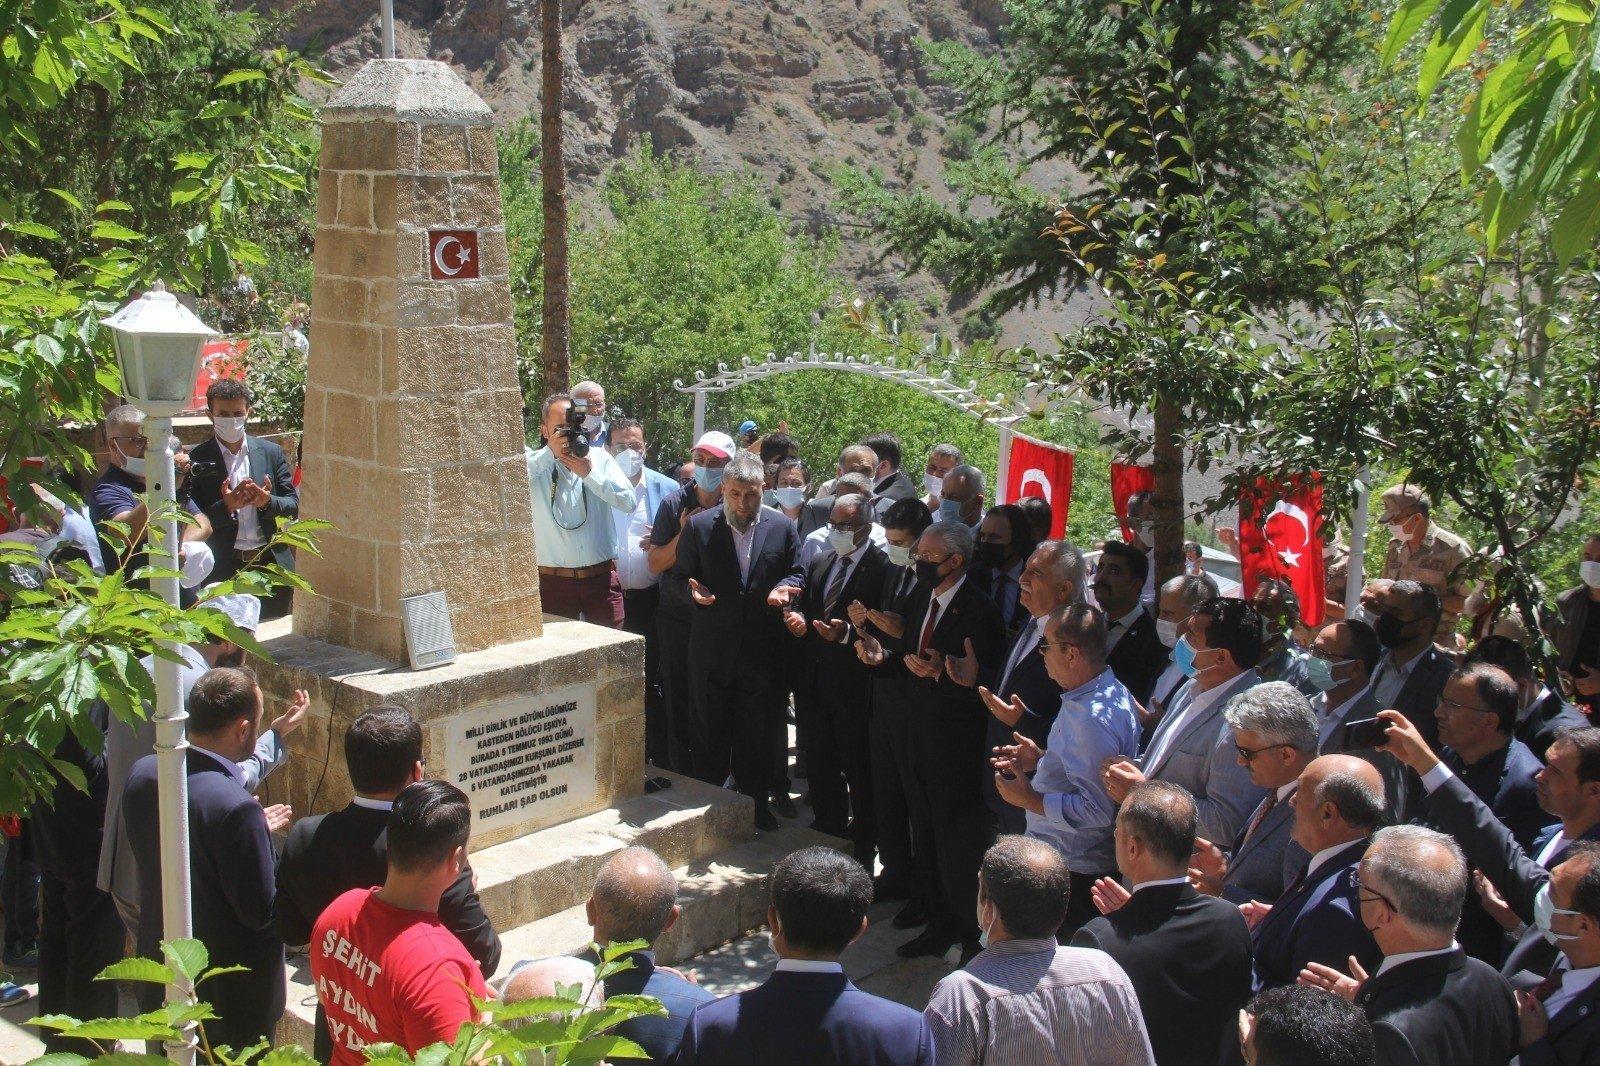 People attend a commemoration ceremony around a memorial to the PKK victims in Başbağlar, Erzincan, eastern Turkey, July 5, 2021. (İHA PHOTO)